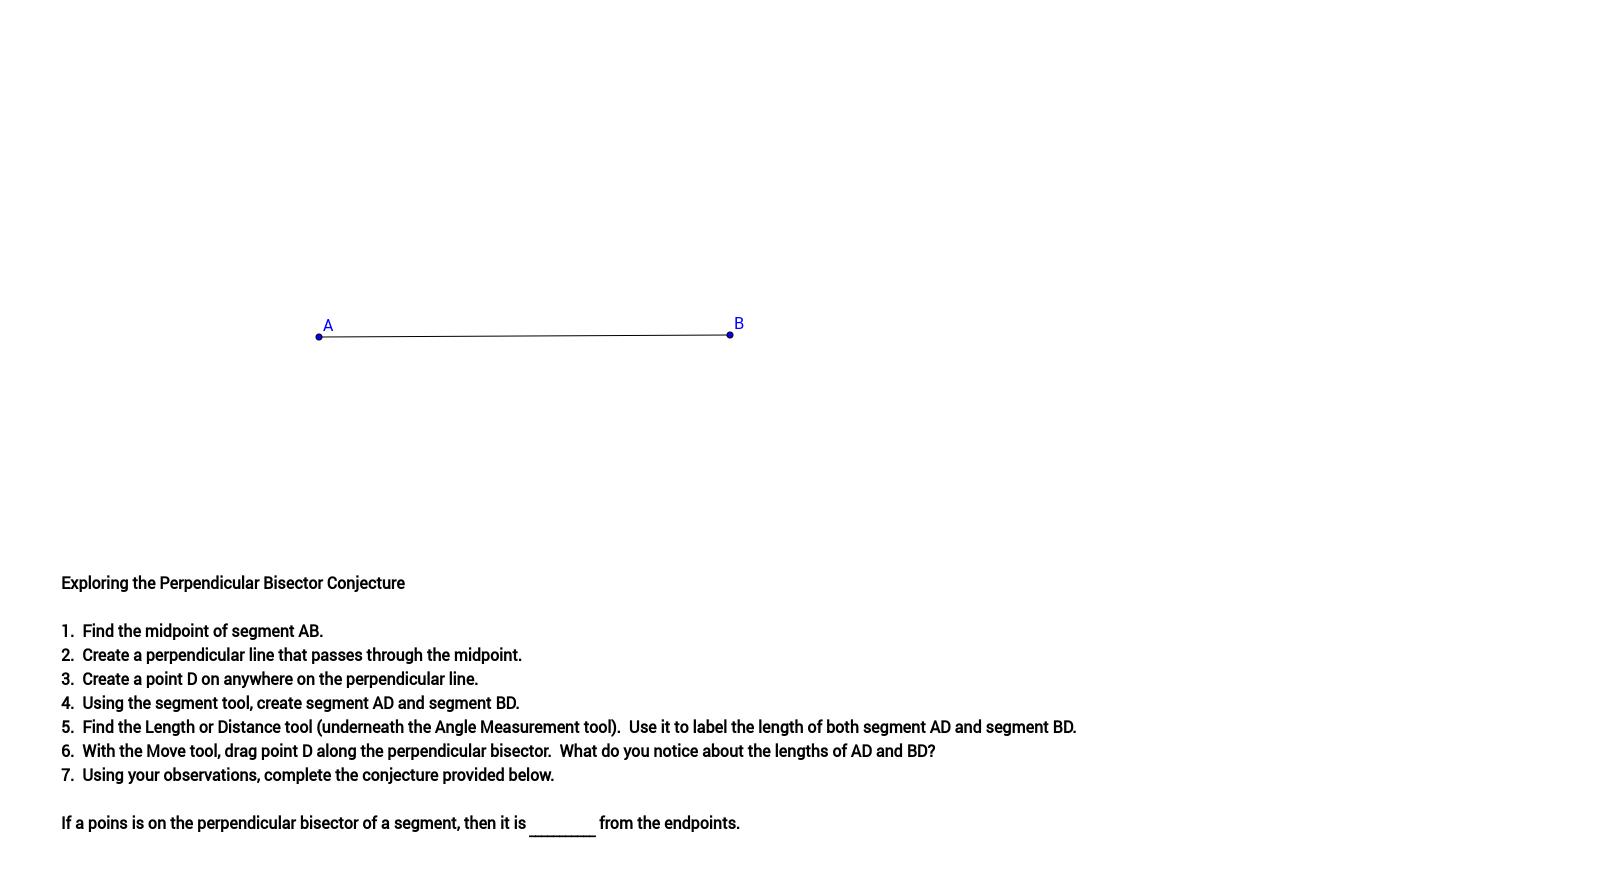 worksheet Perpendicular Bisector Worksheet properties of perpendicular bisectors geogebra